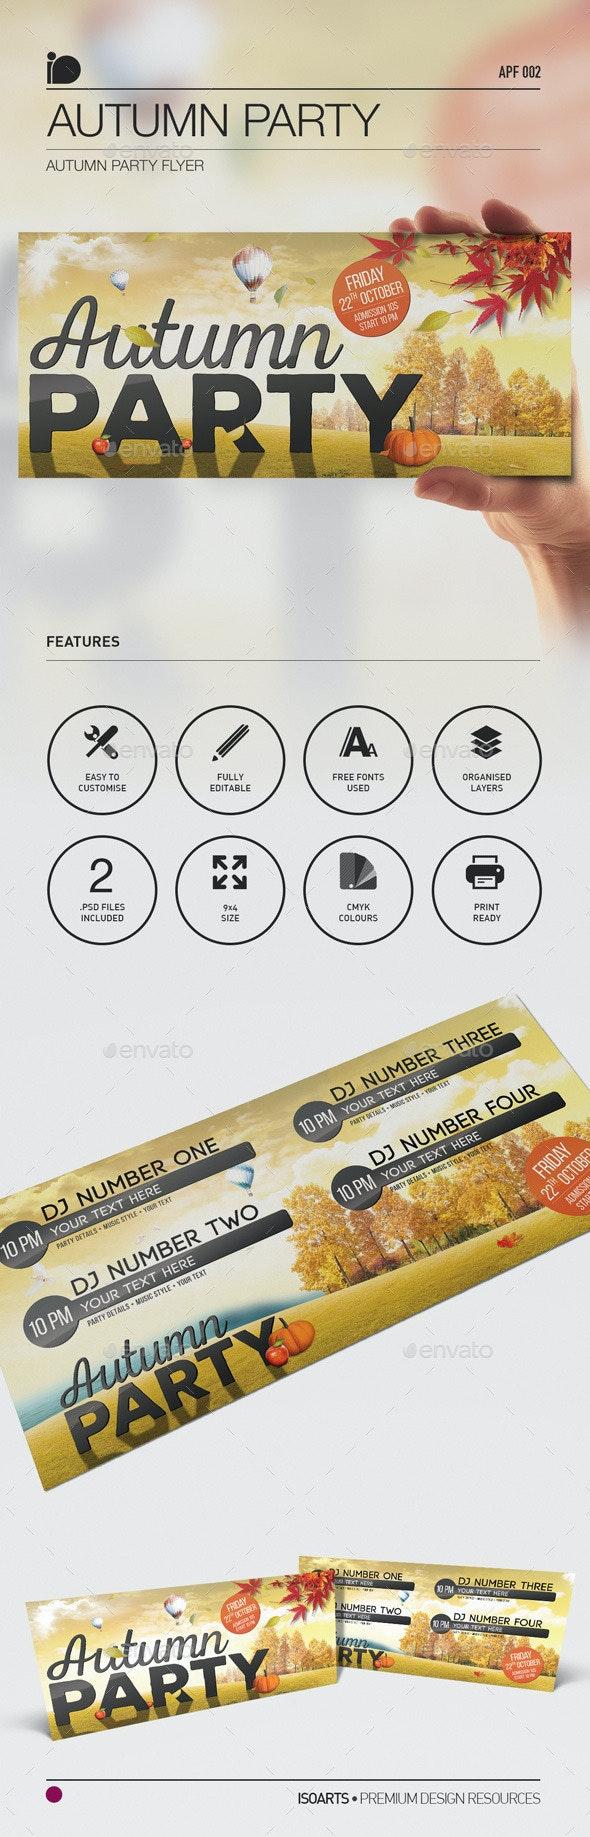 Autumn Party Flyer • Autumn Party - Clubs & Parties Events